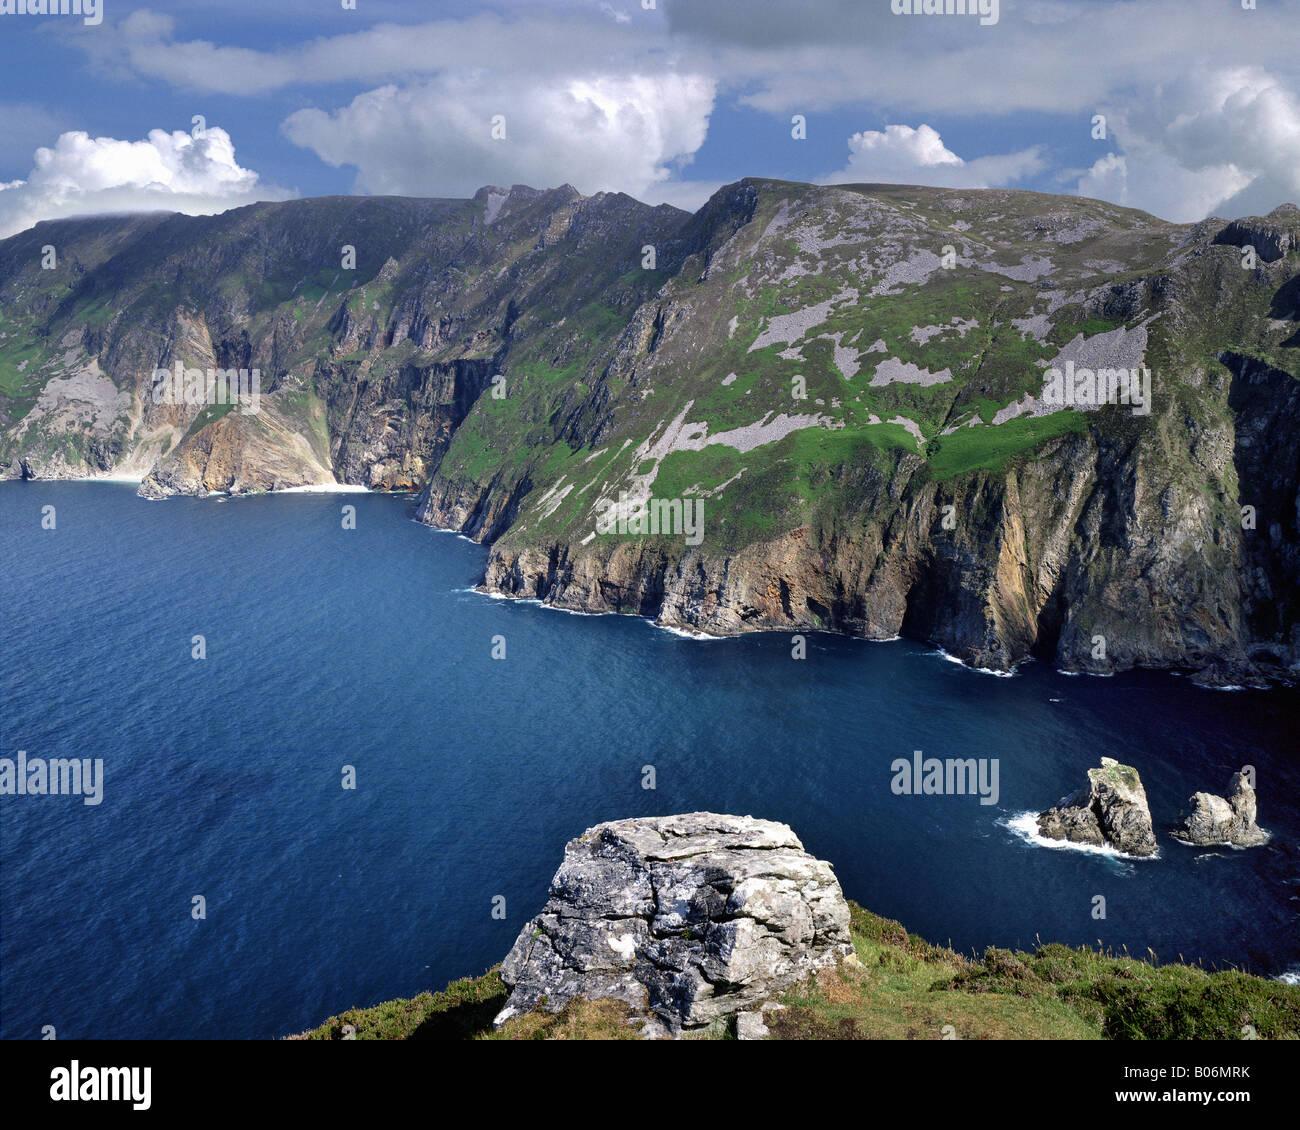 IE - CO.DONEGAL: Slieve League Cliffs - Stock Image